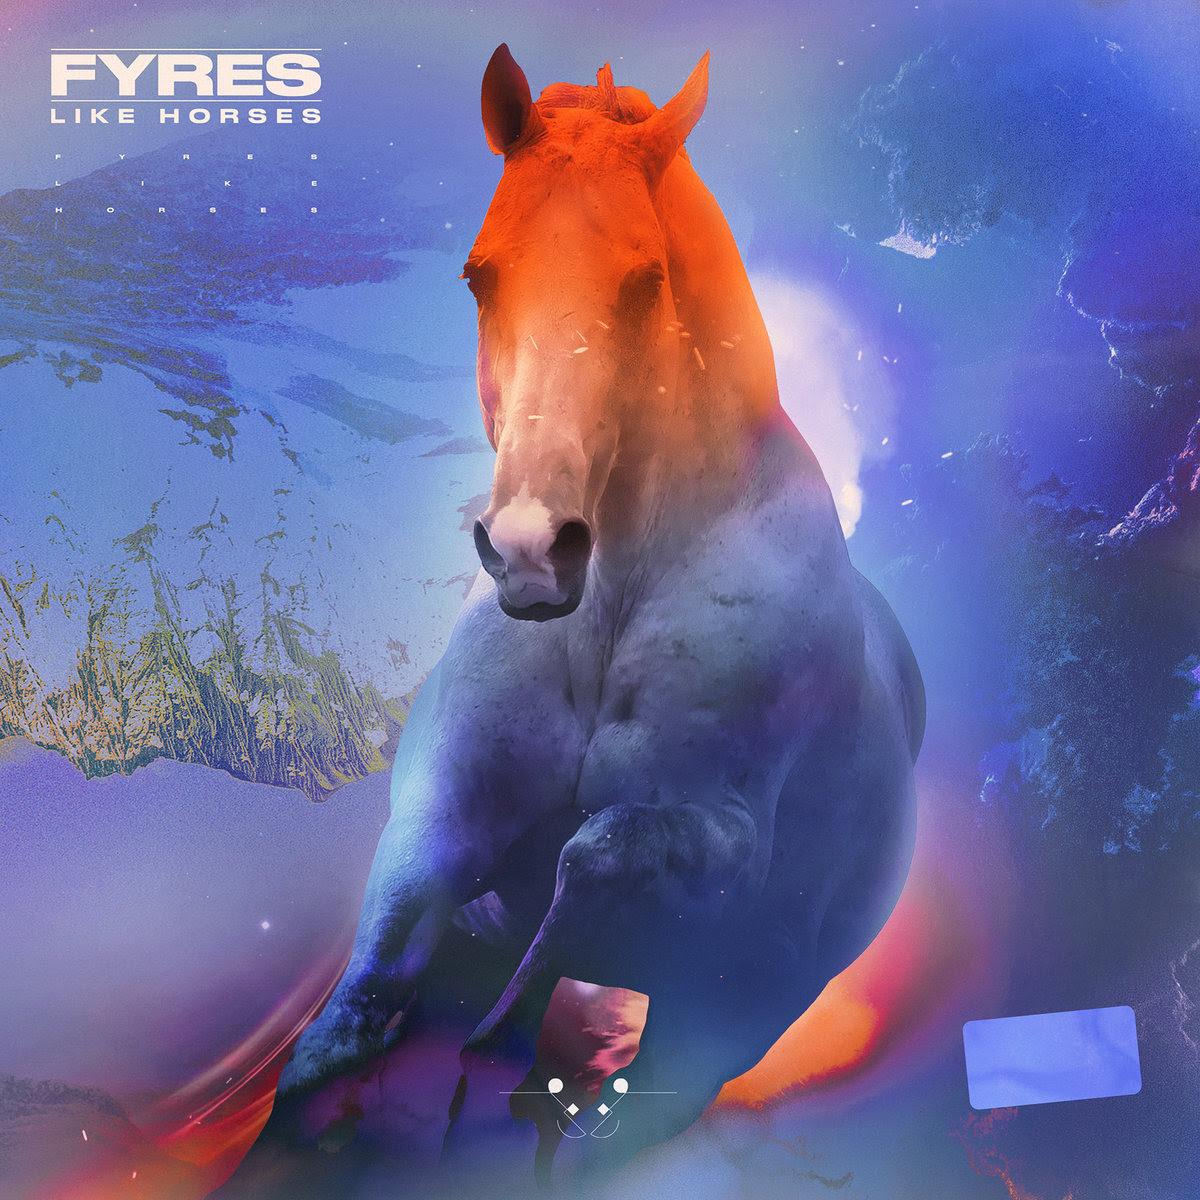 fyres Likes a horse artwork